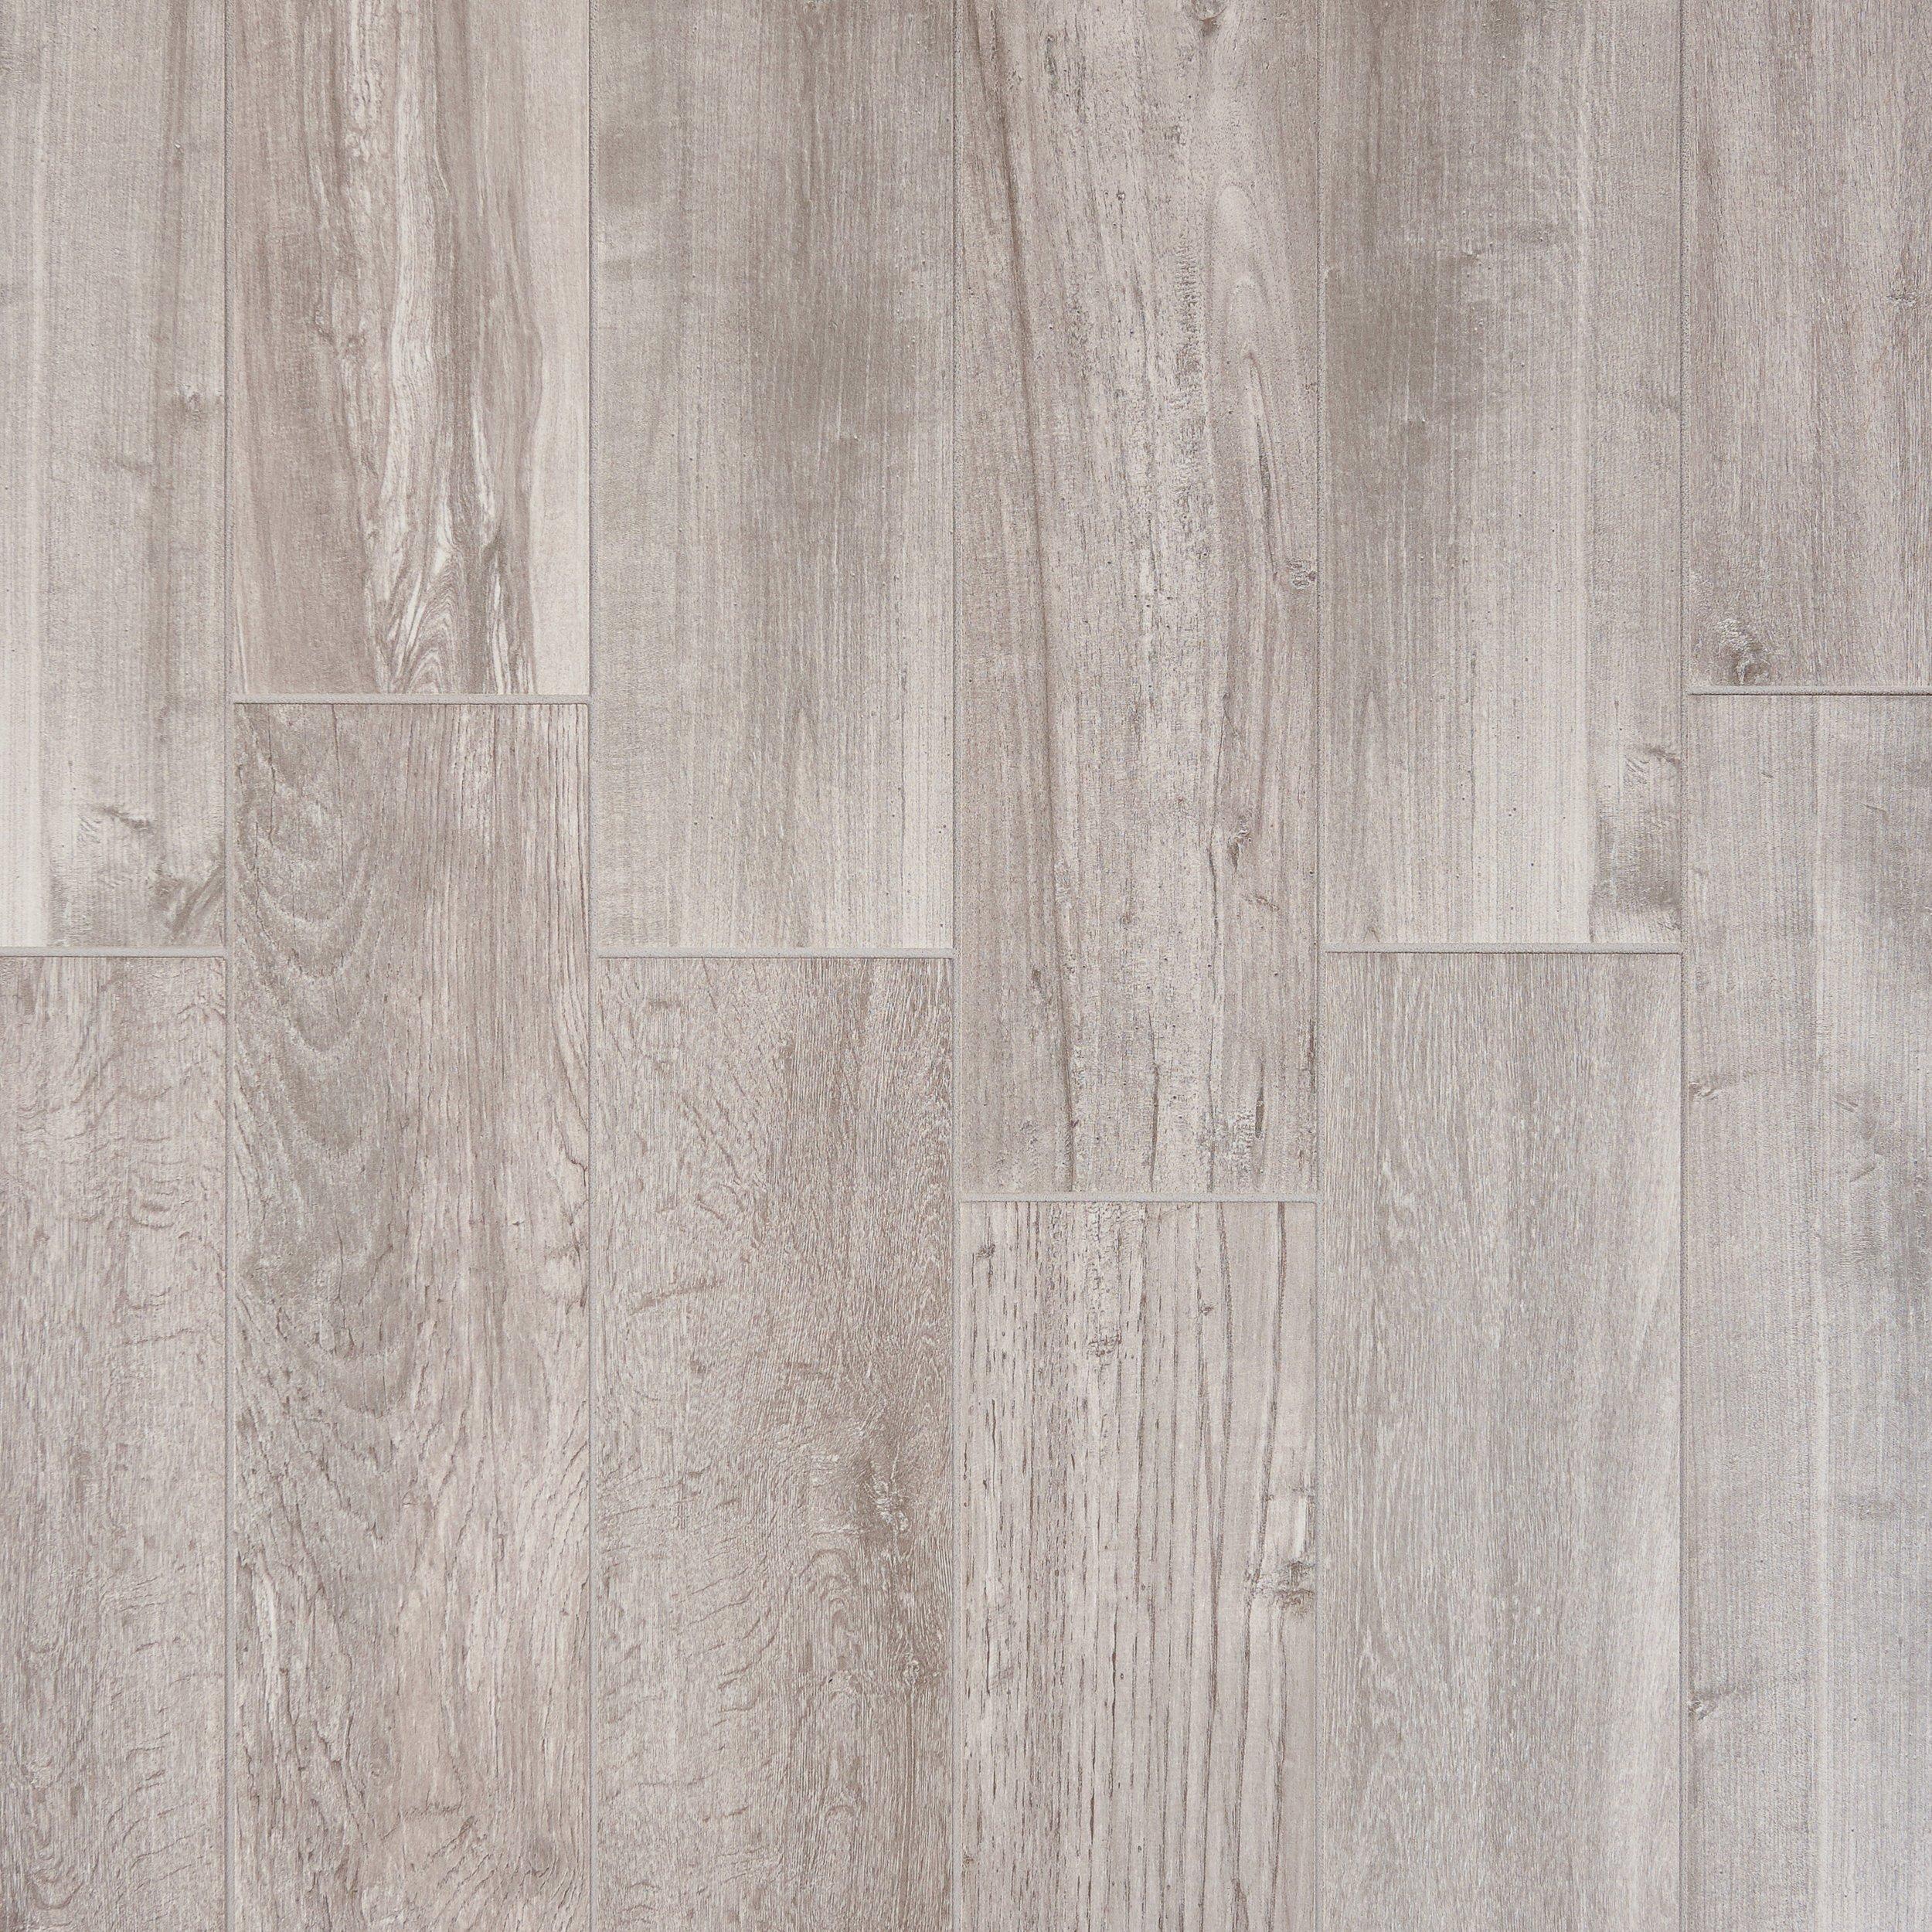 Lumber Gray Wood Plank Porcelain Tile 6in x 24in 100105873